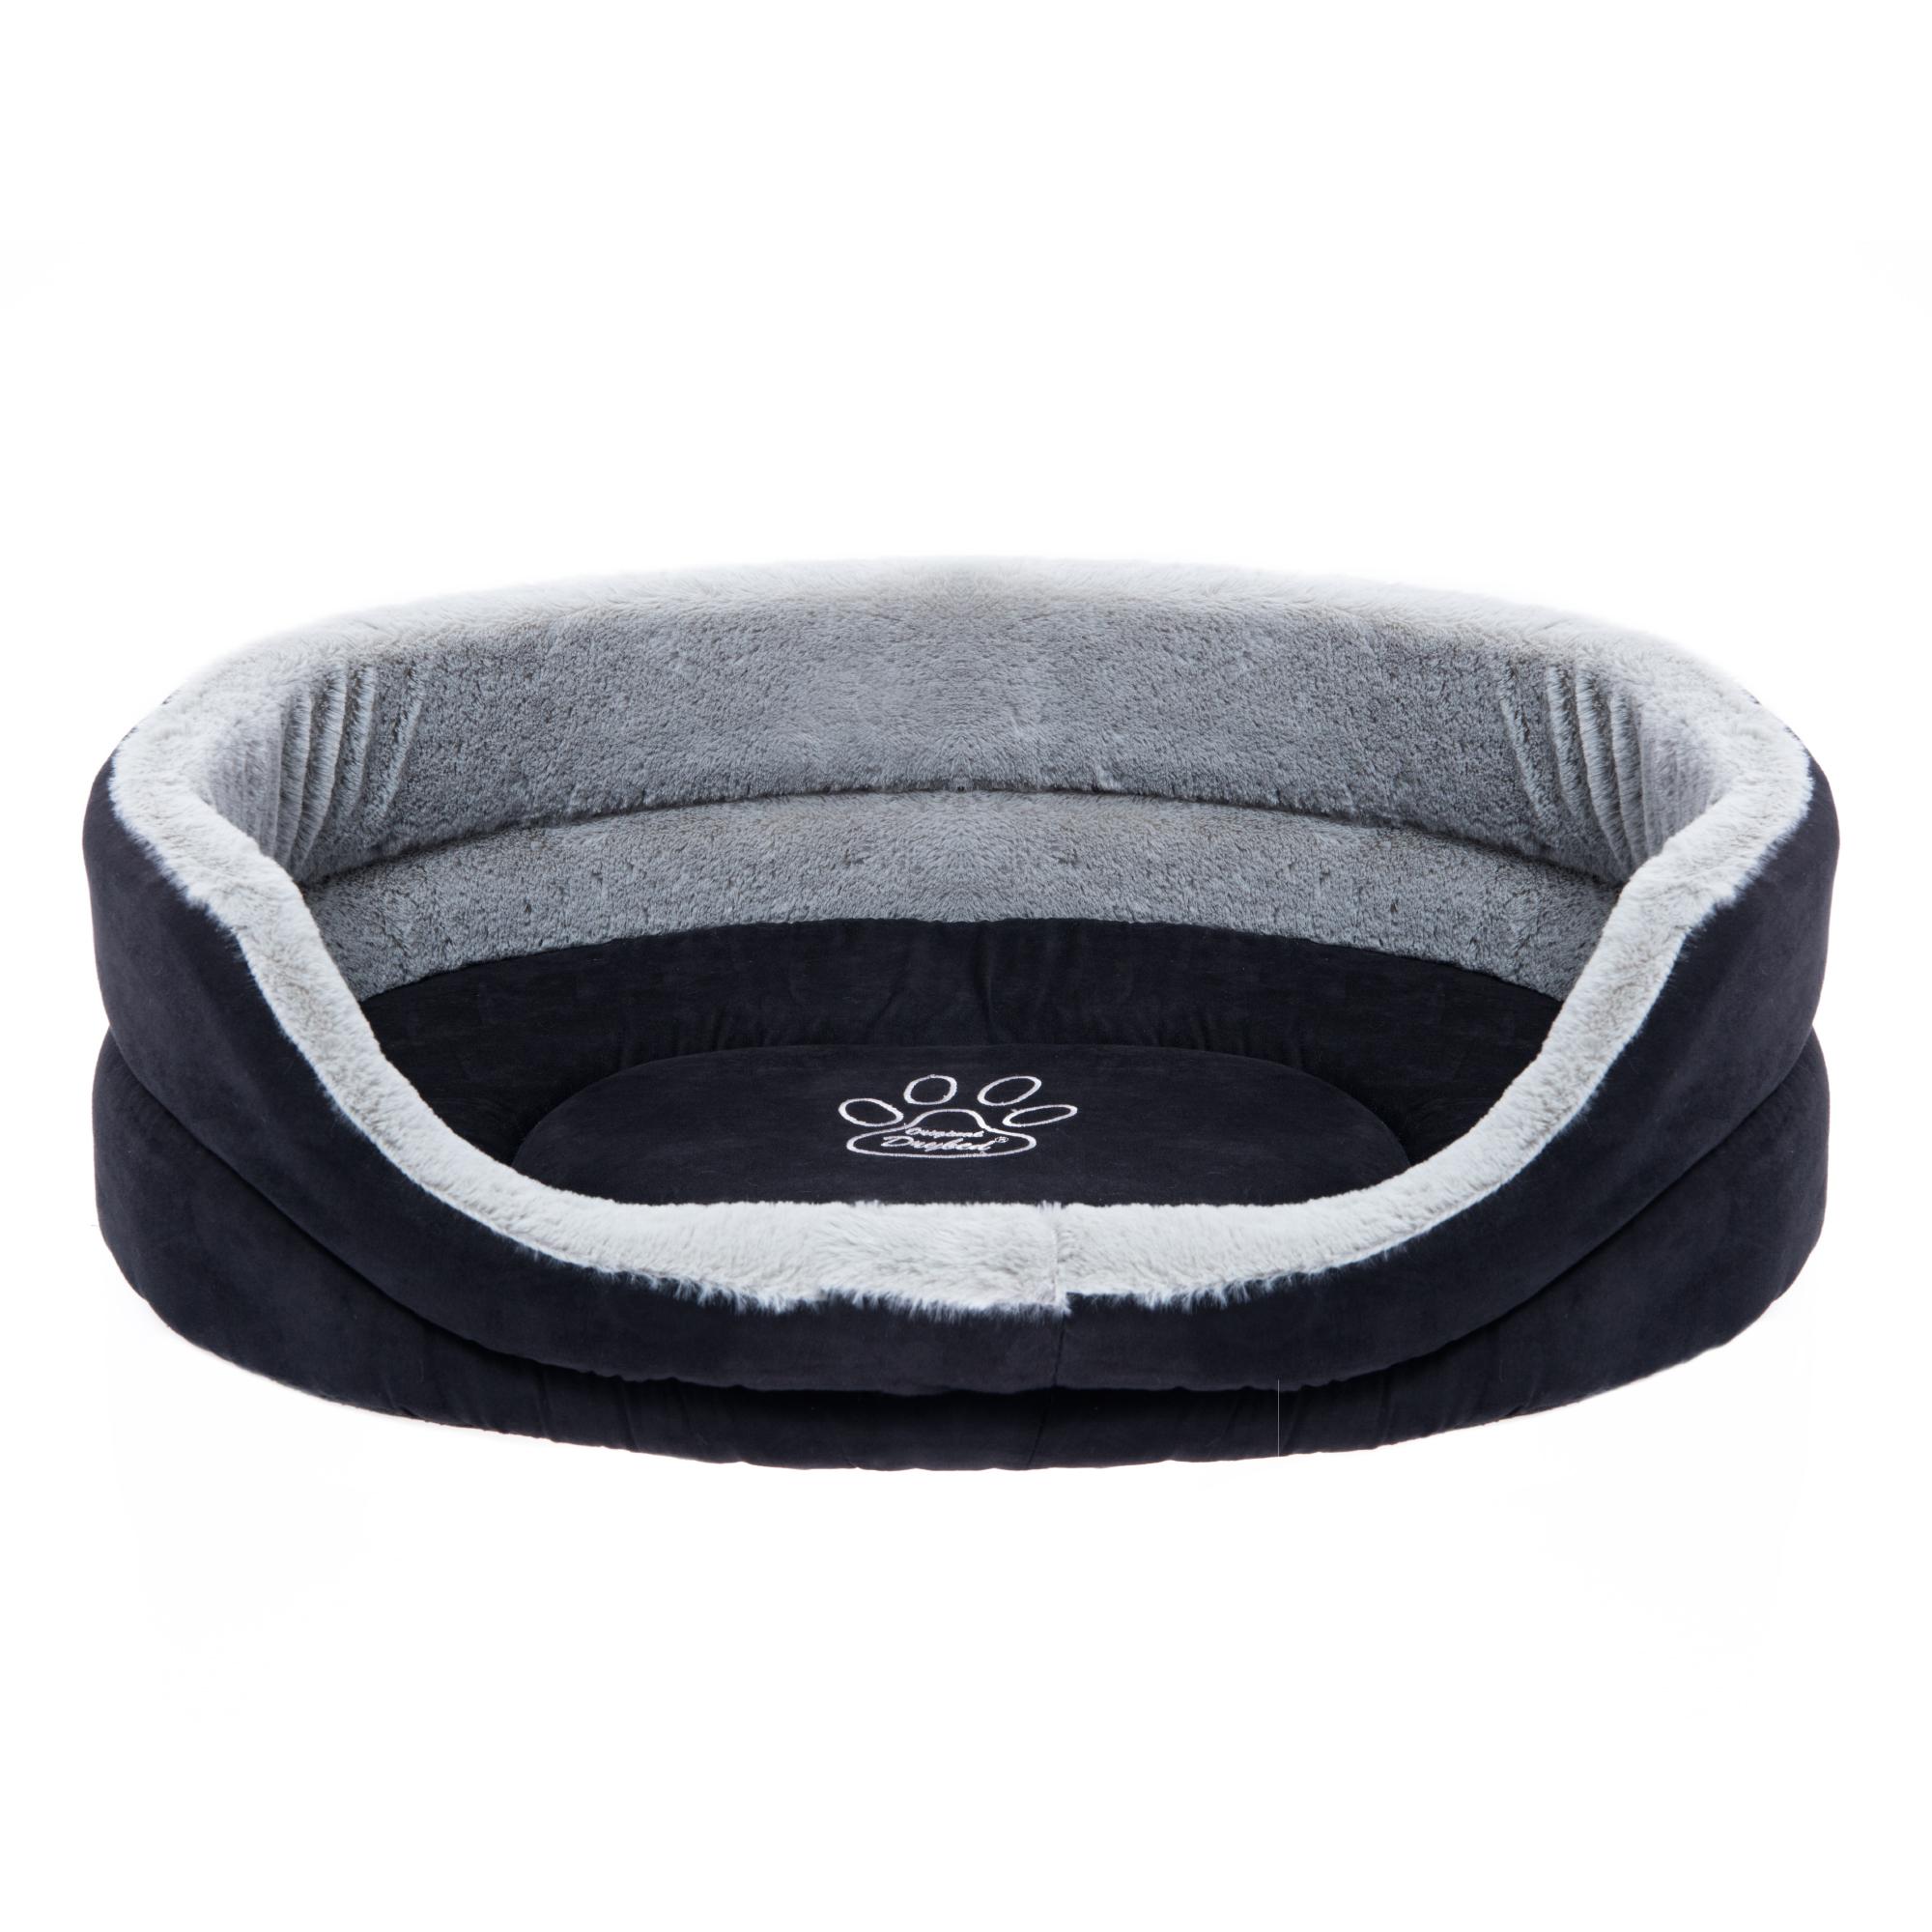 Drybed Hundekörbchen schwarz / grau Gr. S 60cm Nr. 012N